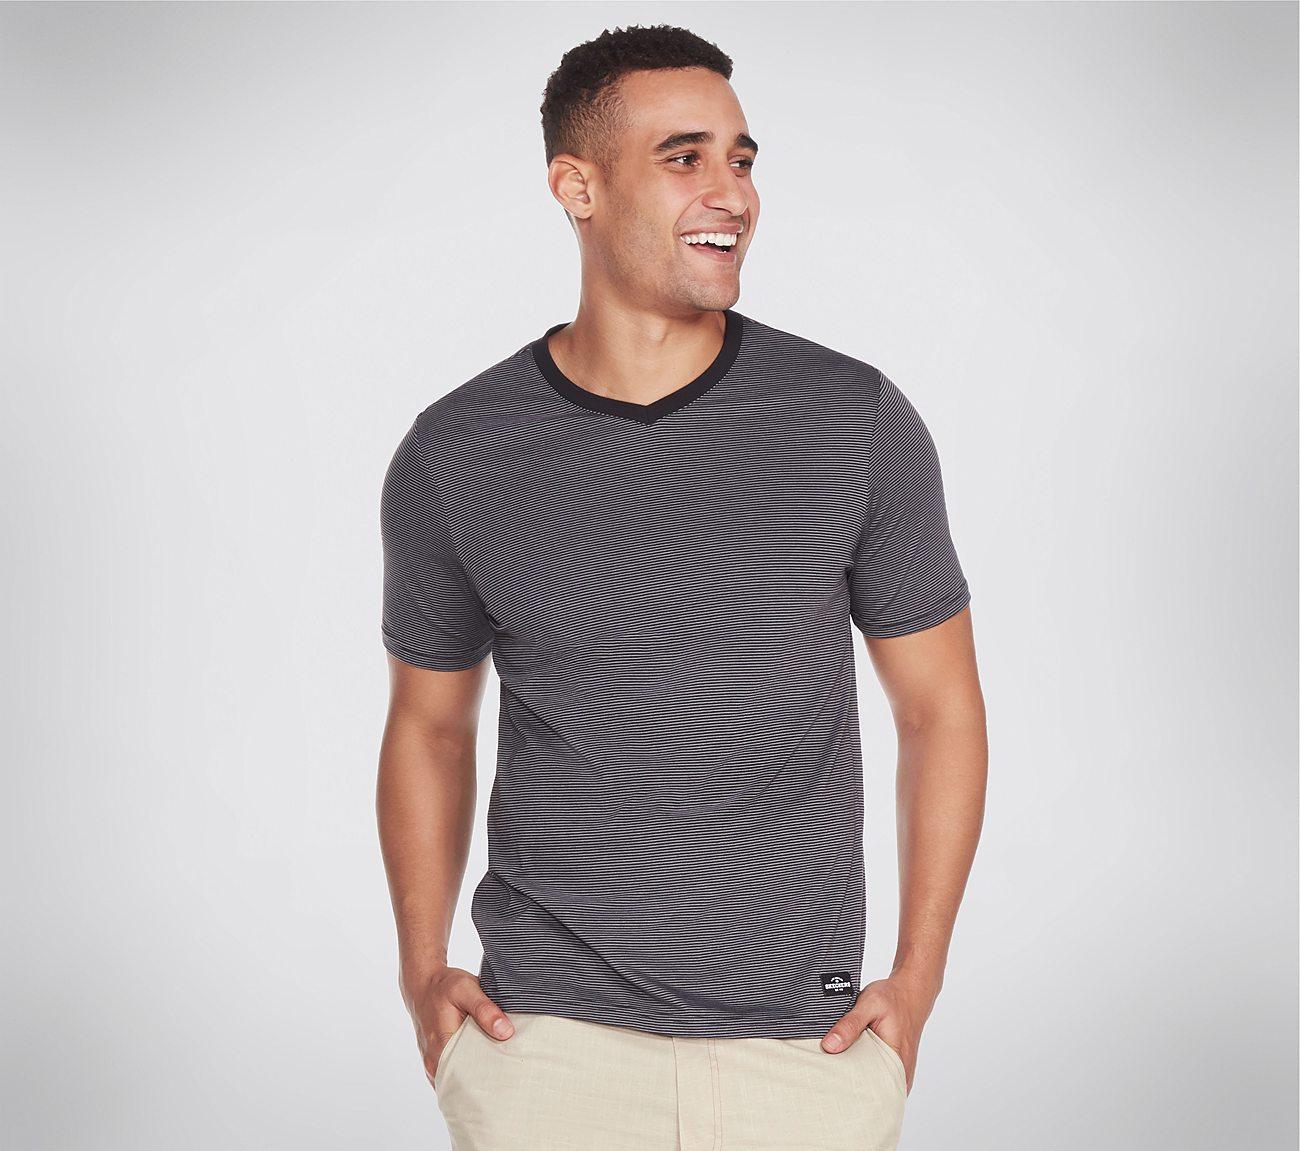 Skechers Apparel Foreshore Tee Shirt